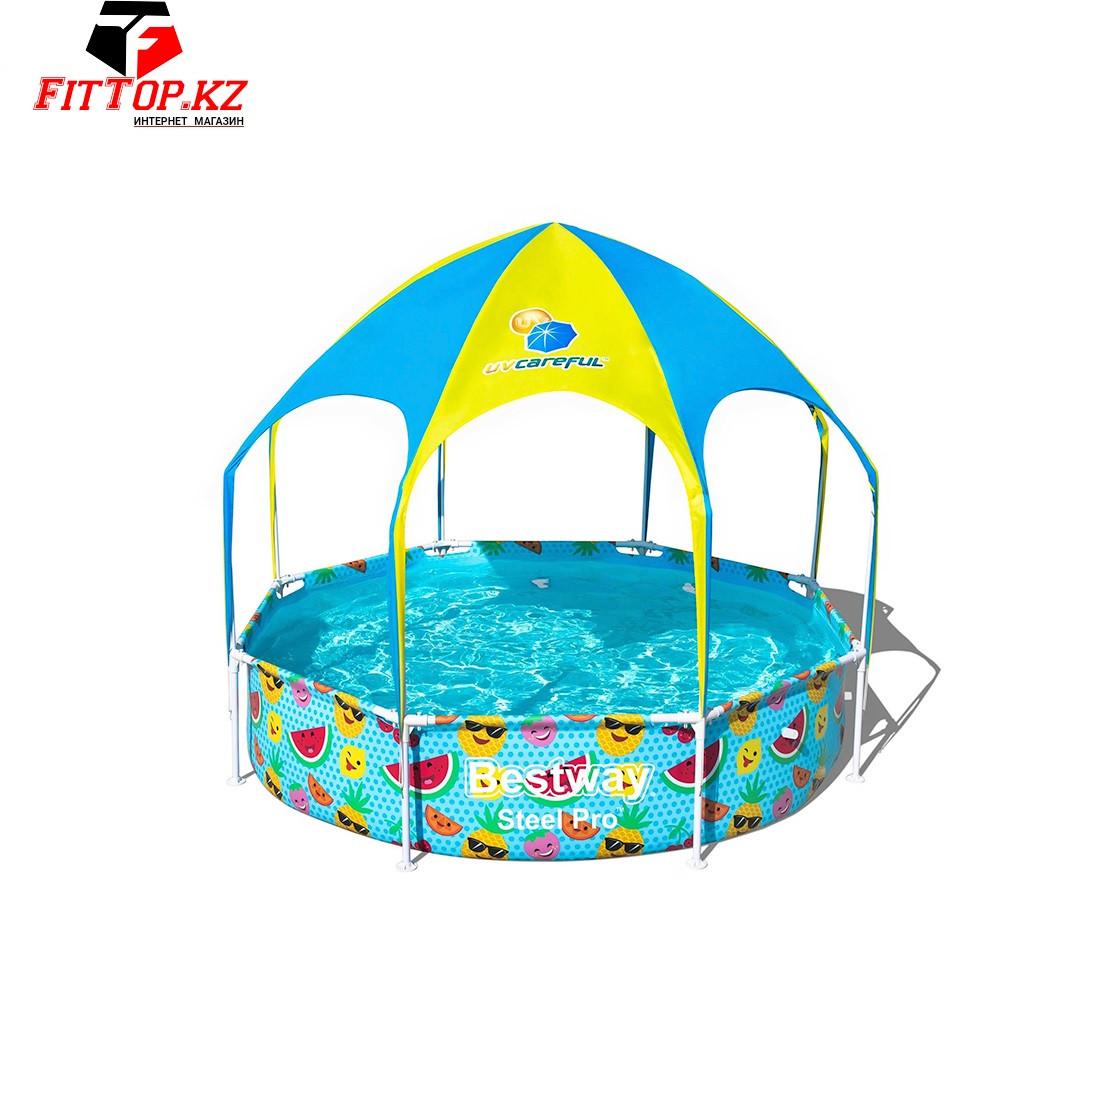 Детский каркасный бассейн Steel Pro Splash-in-Shade 244 х 51 см, BESTWAY, 56432 (56193)